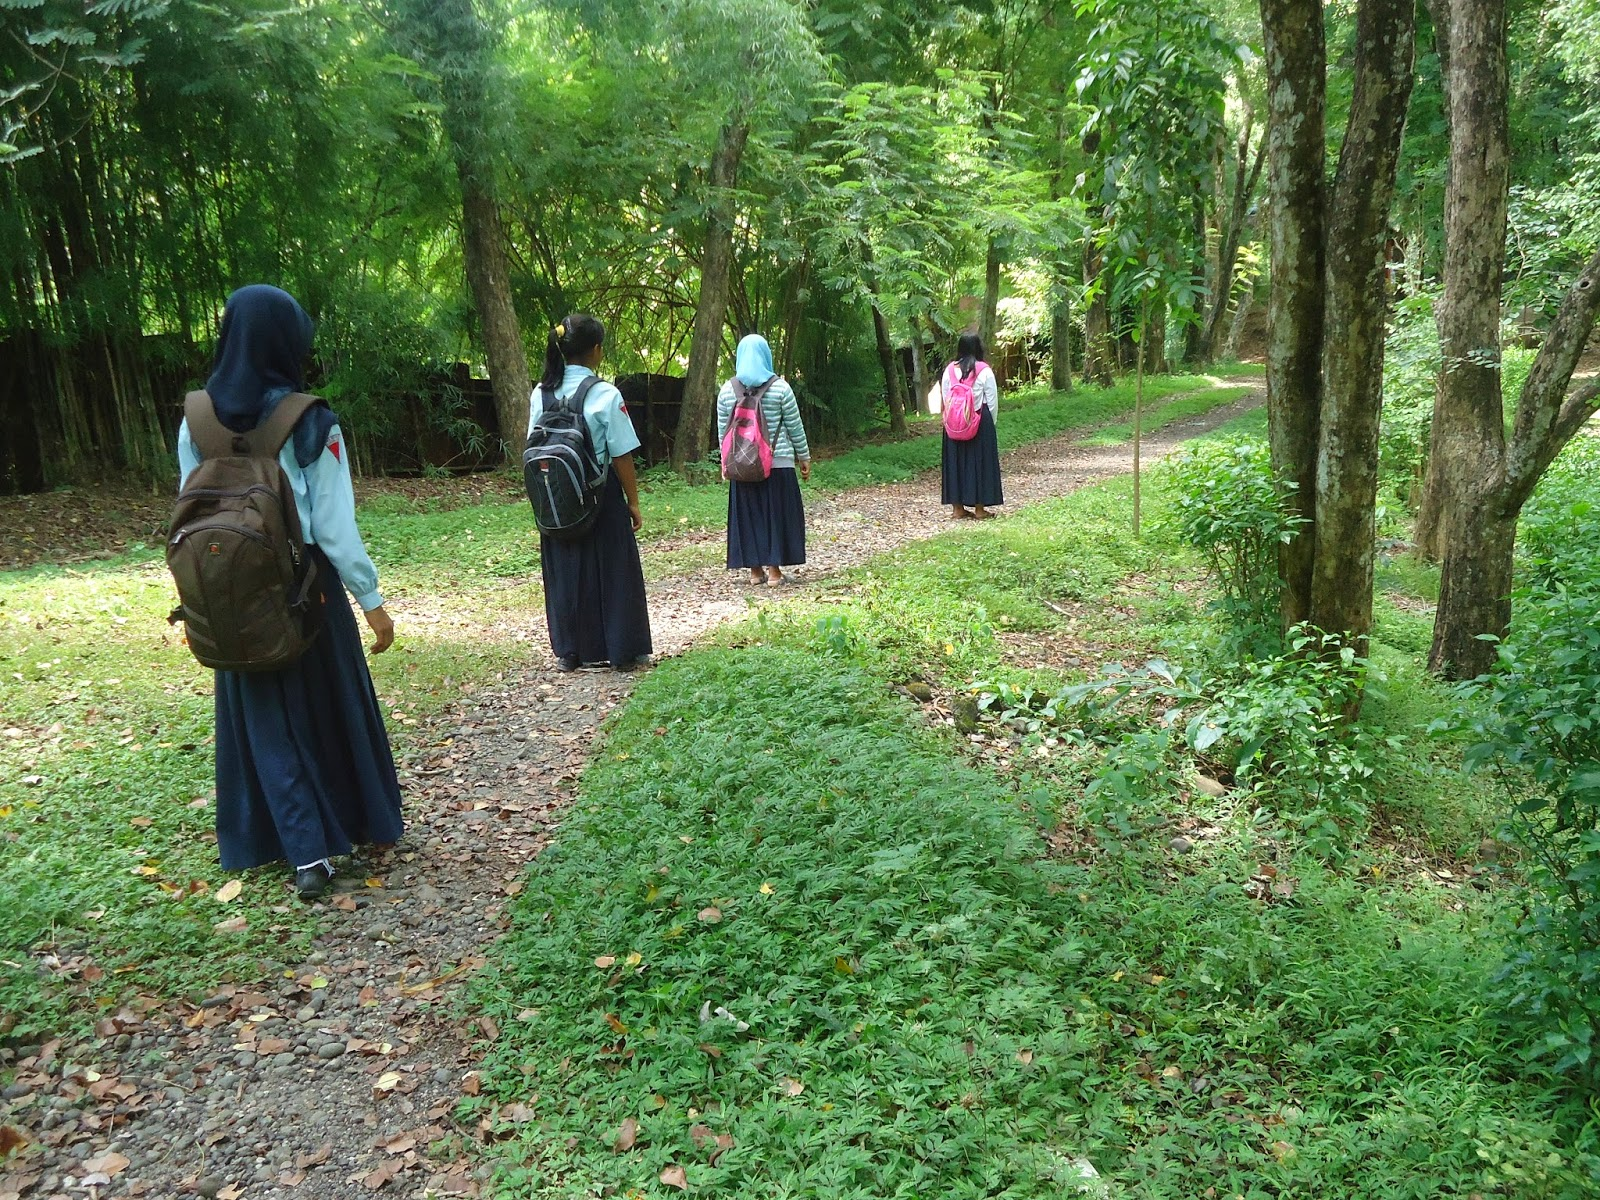 Museum Online Sejarah Ngawi Sma Negeri 1 Karangjati Sendang Tawun